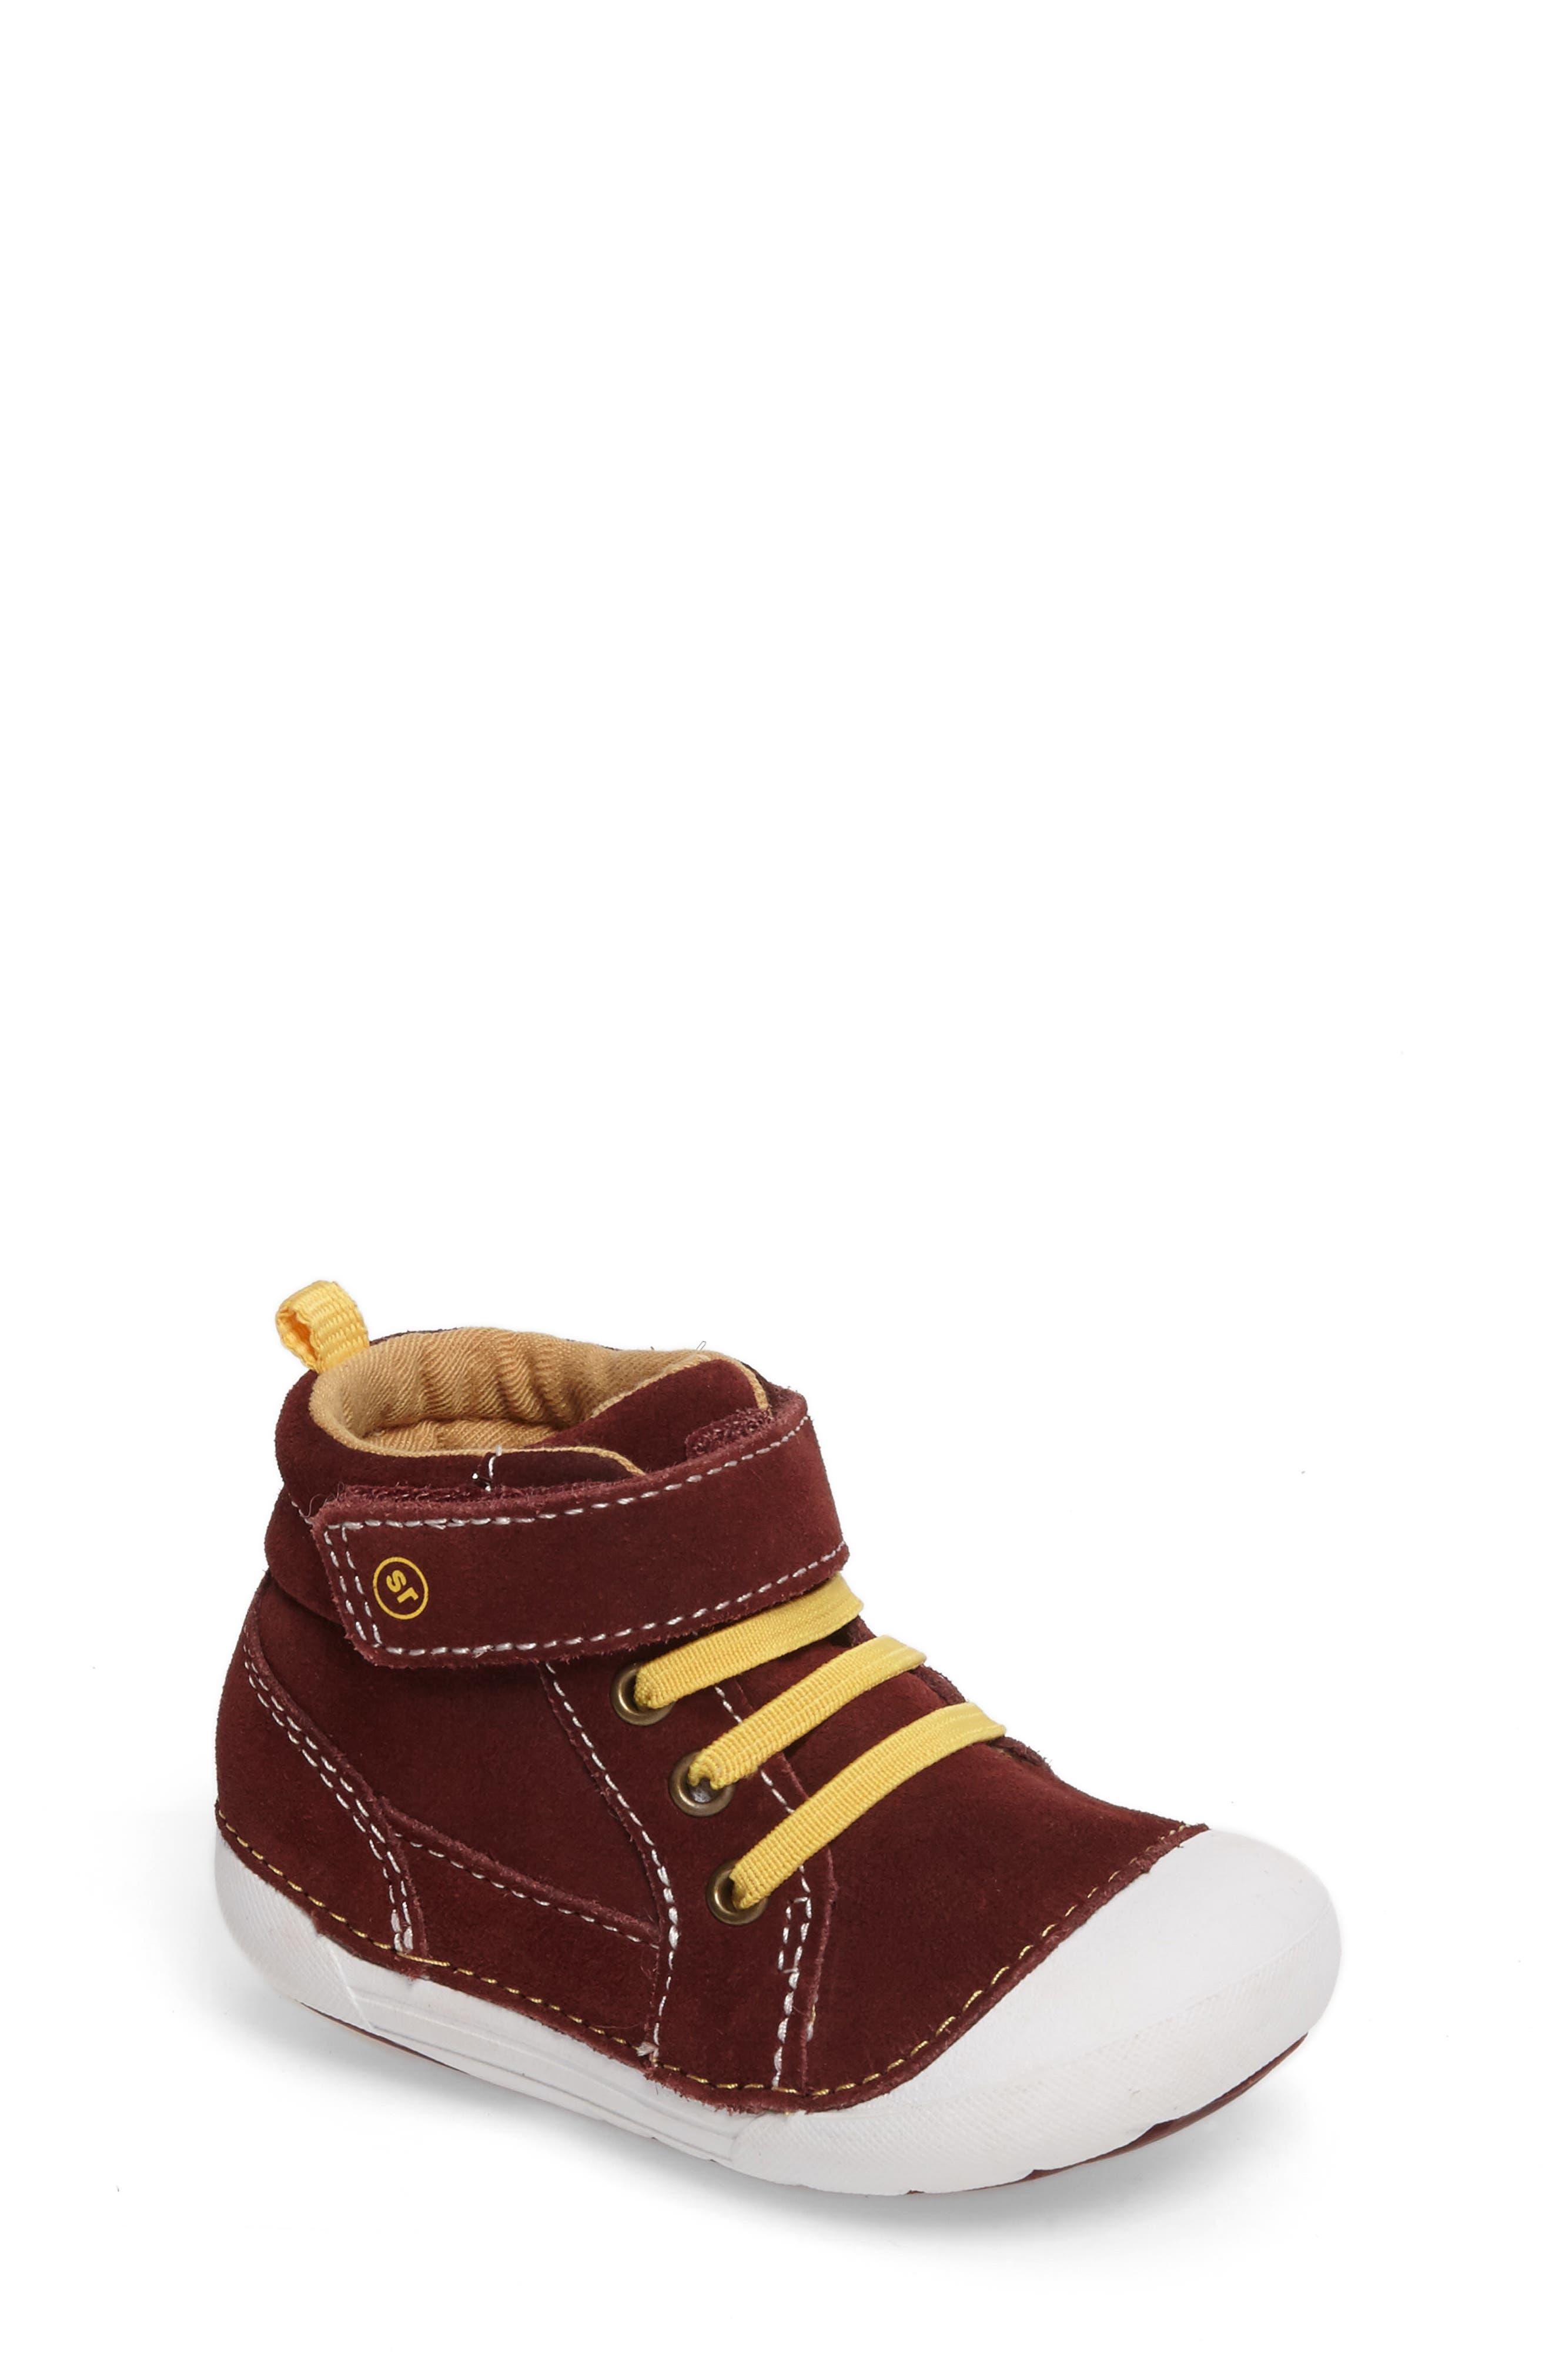 Main Image - Stride Rite Soft Motion Danny Sneaker (Baby & Walker)